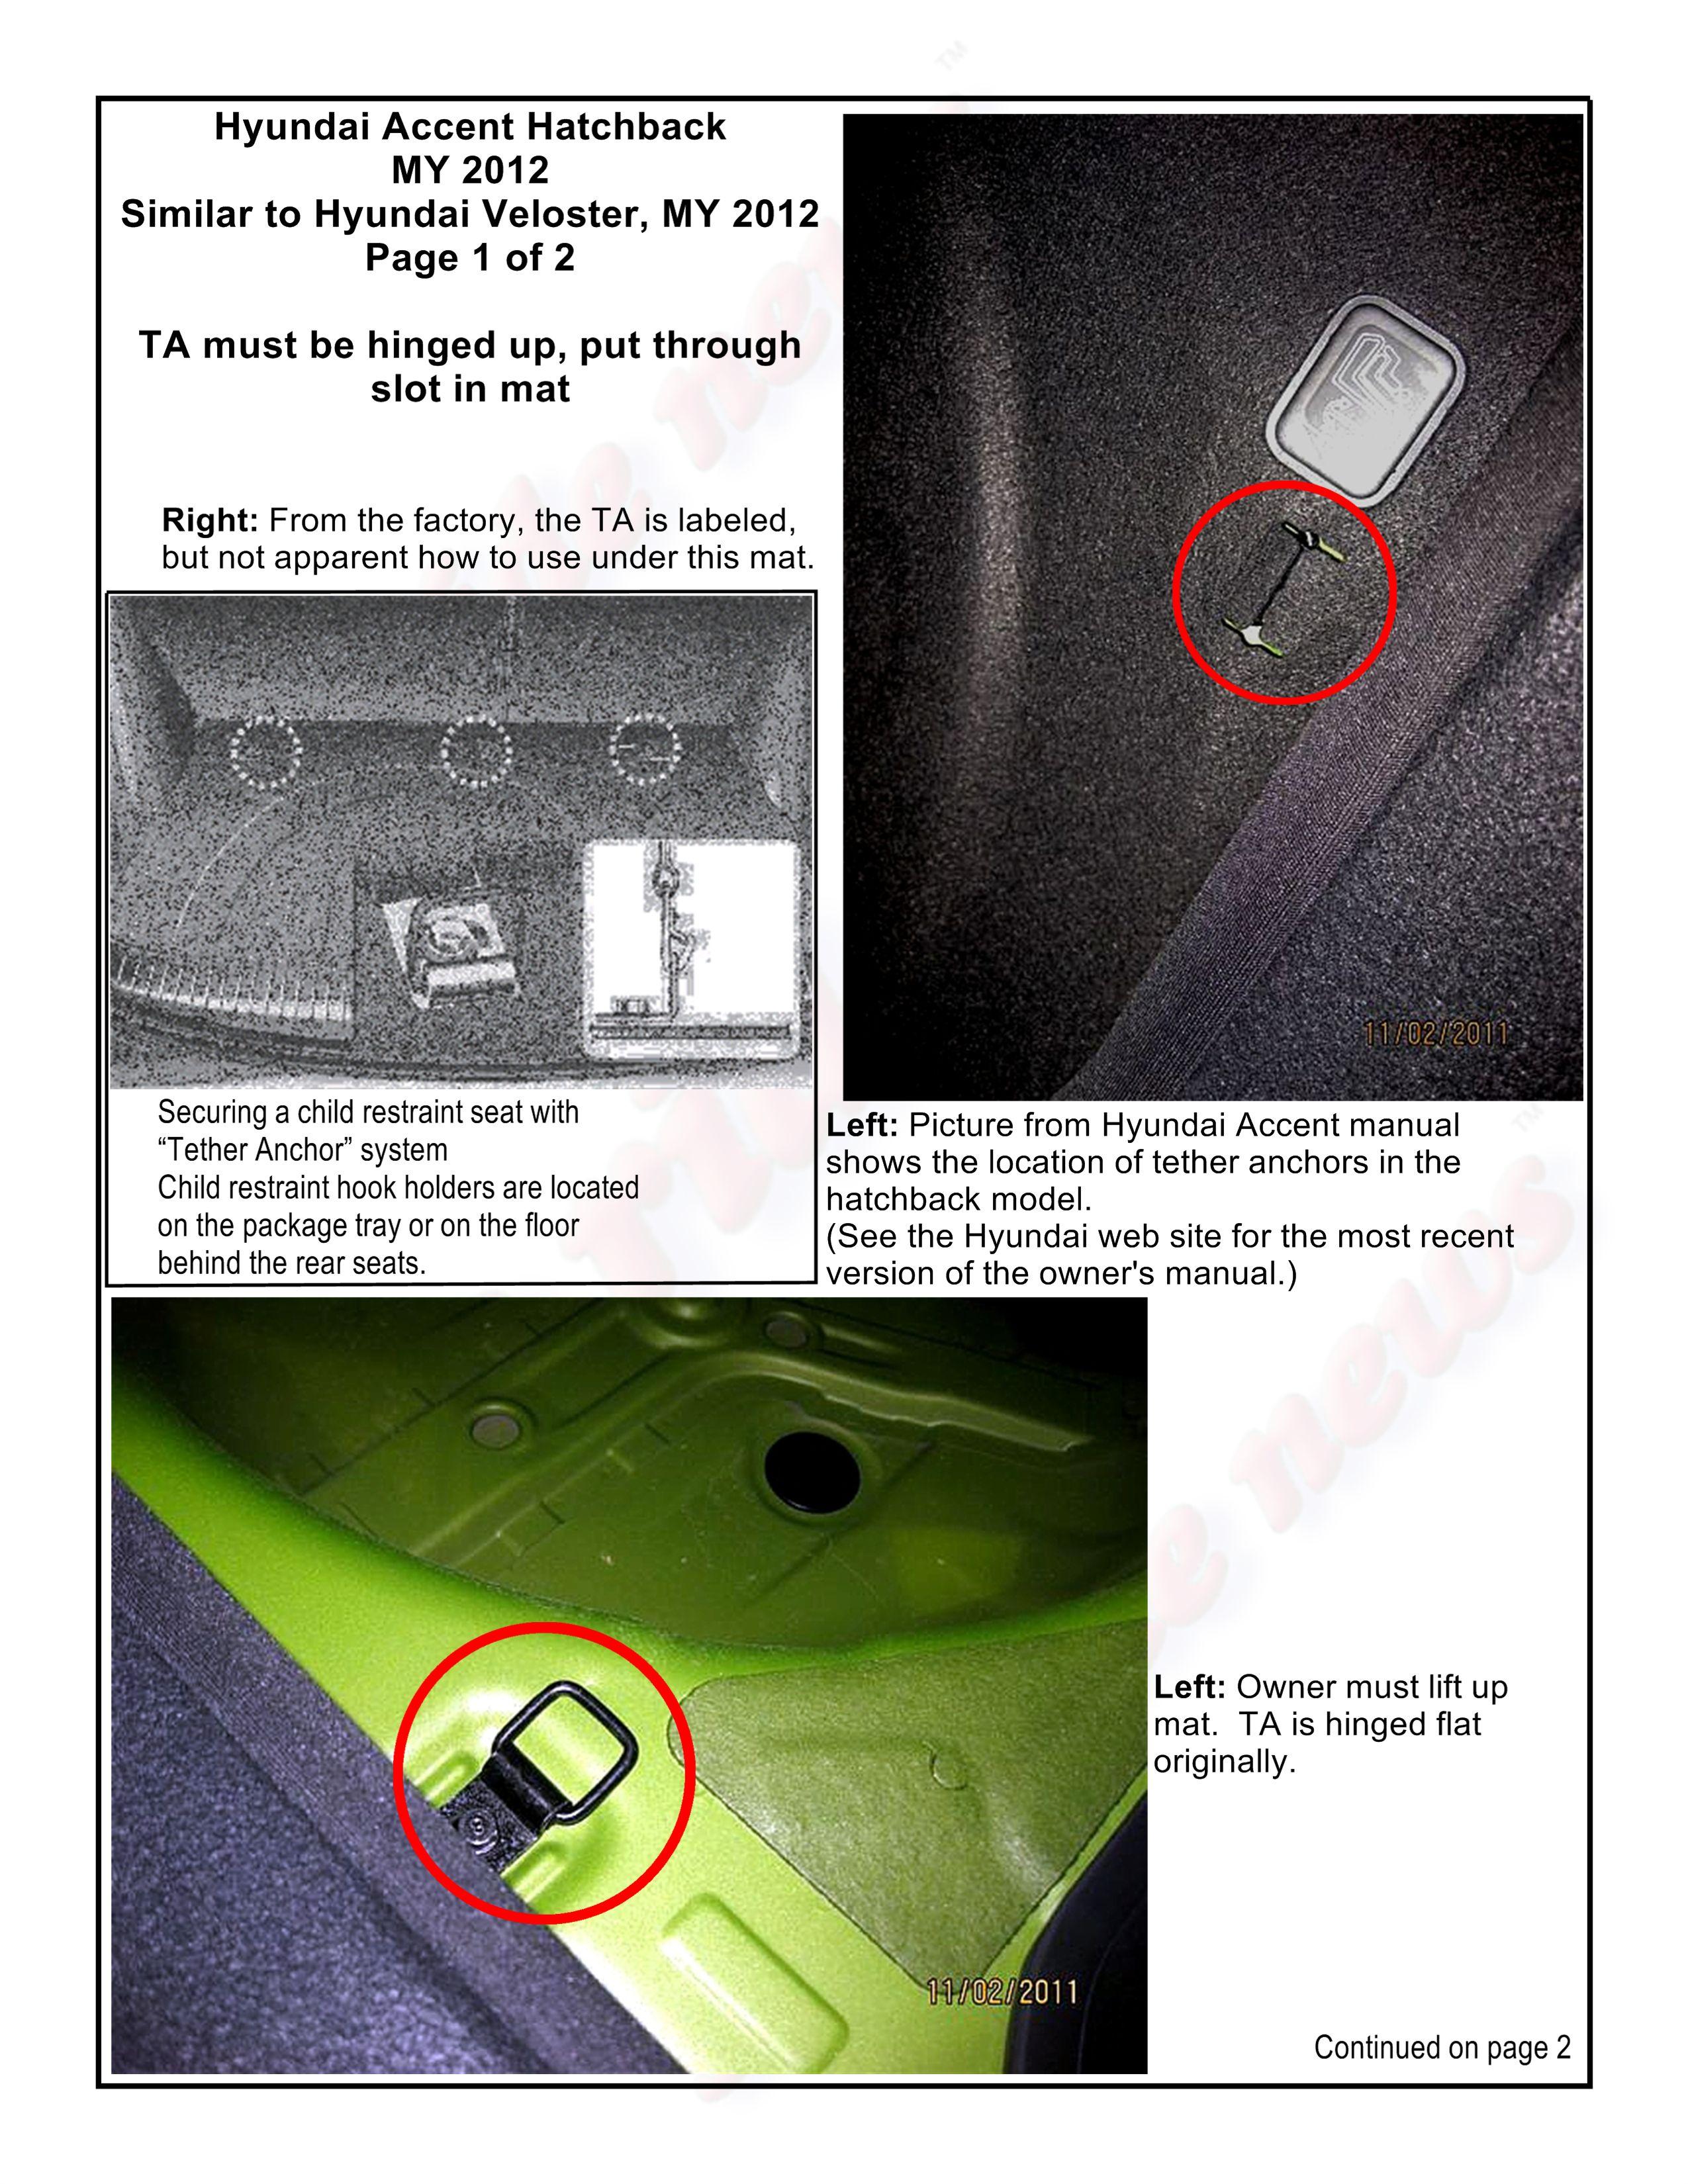 Toyota RAV4 Service Manual: Child restraint seat tether anchor